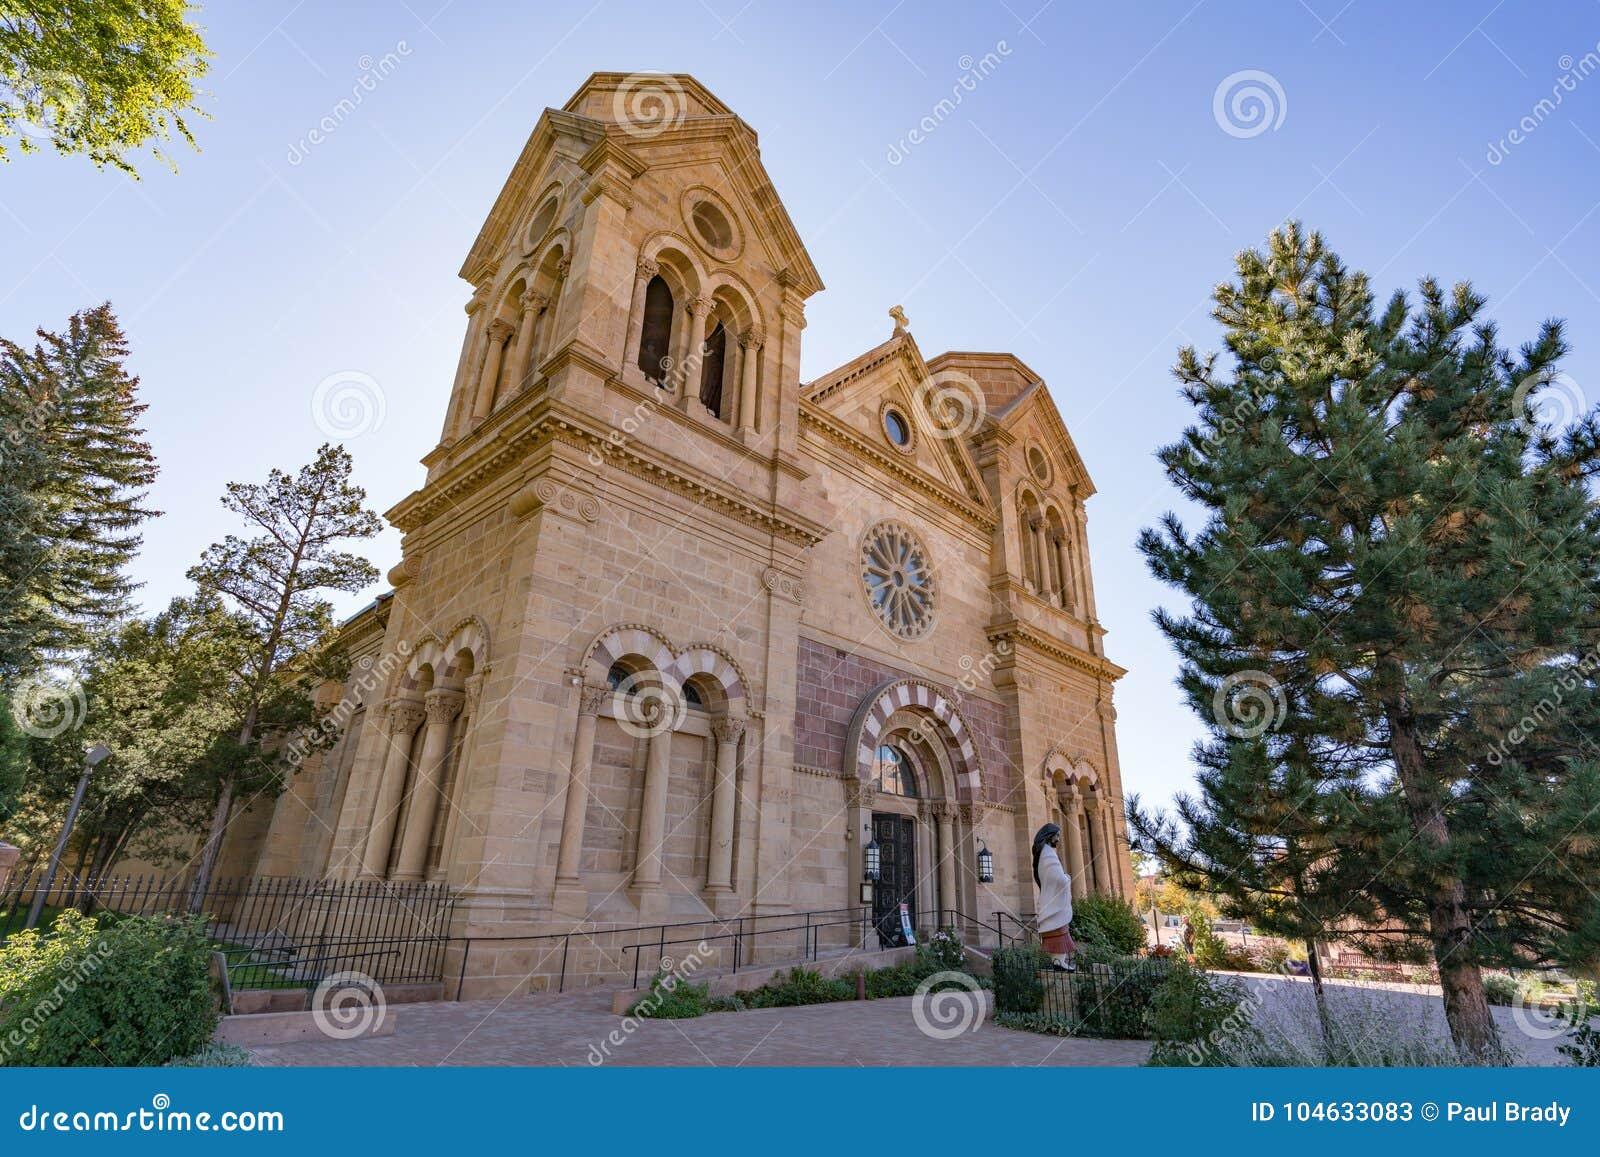 Download Kathedraal Bascilica Van St Francis Assisi In Santa Fe Redactionele Stock Foto - Afbeelding bestaande uit facade, toerisme: 104633083